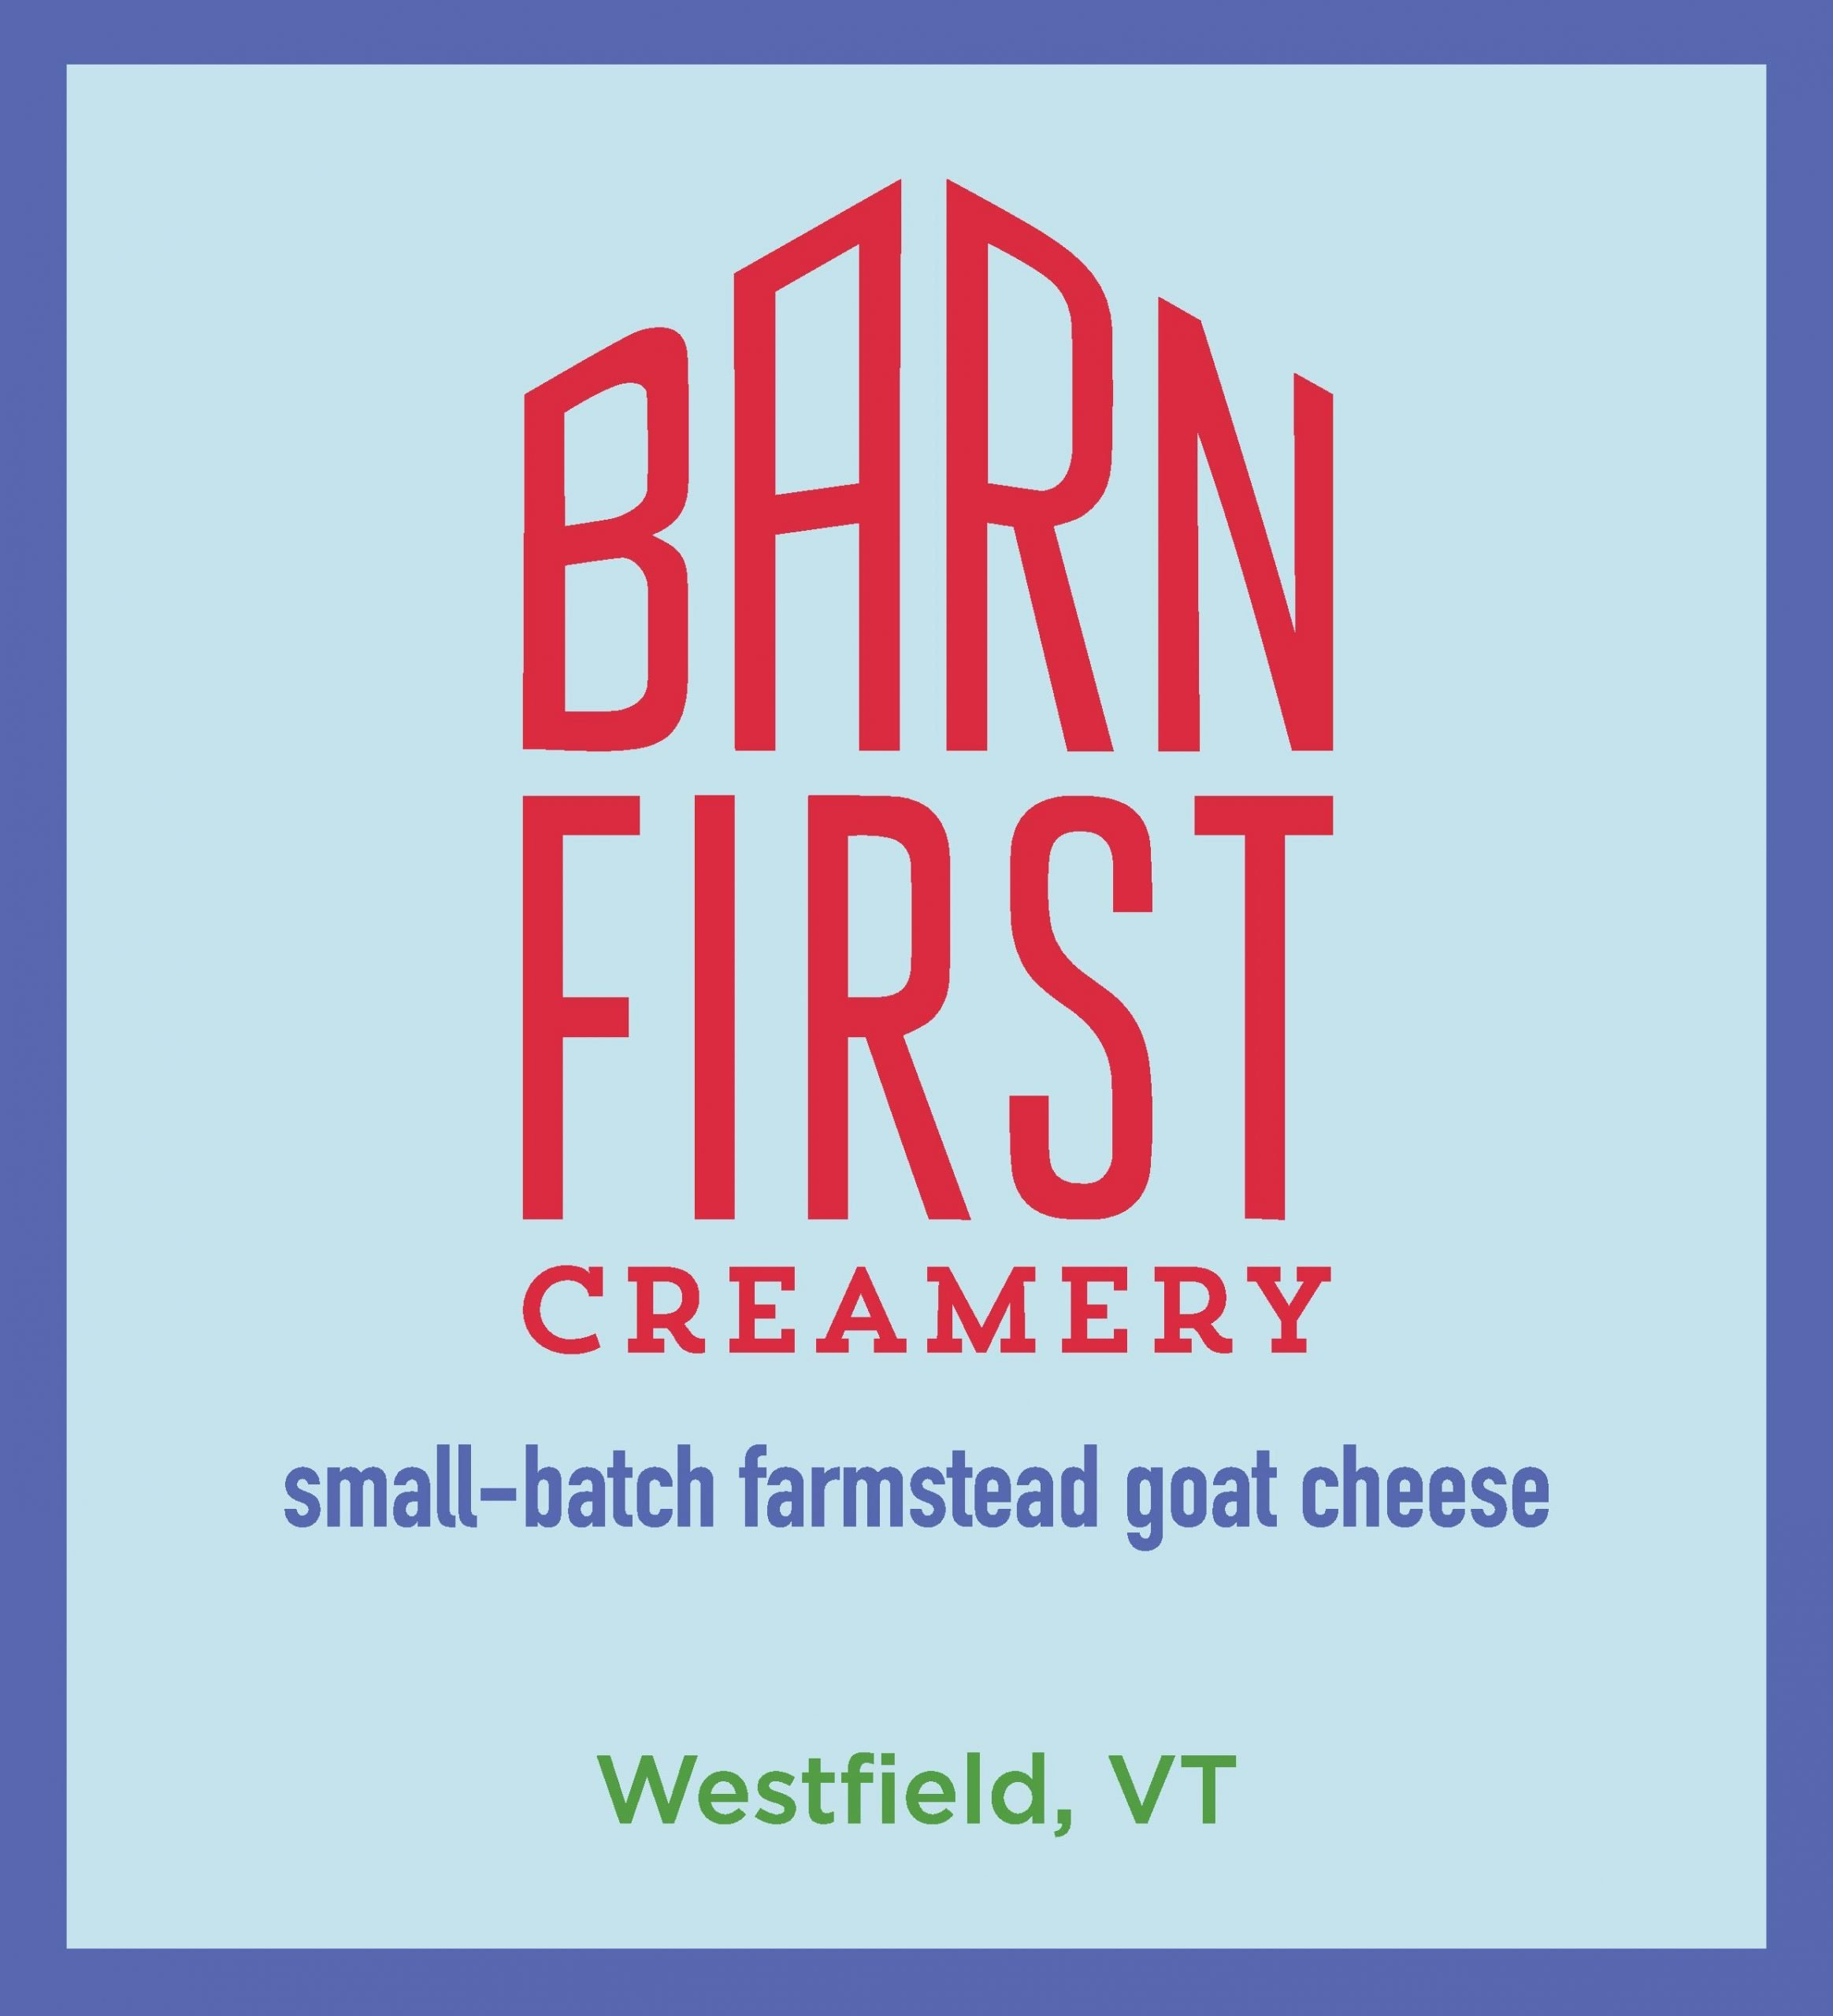 Barn First creamery - logo